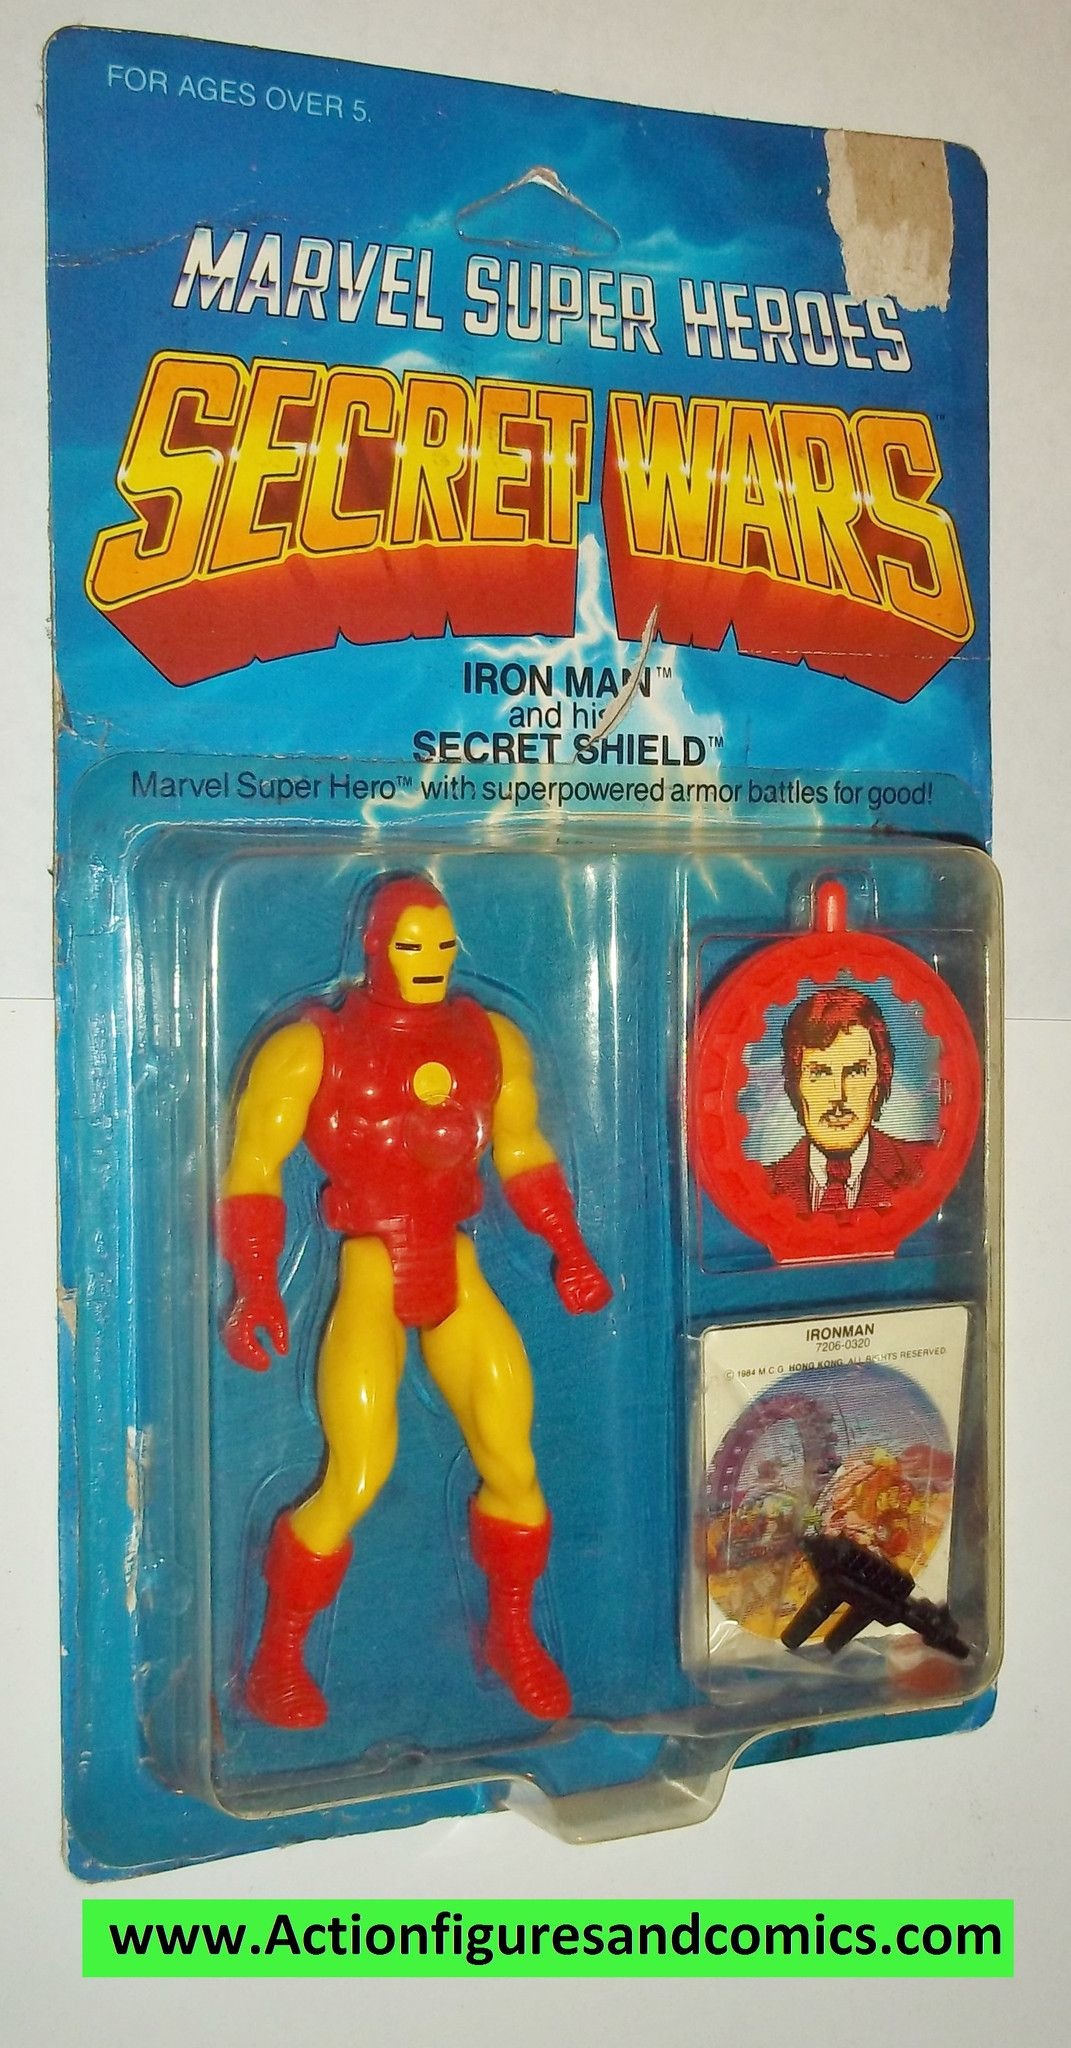 Old Mattel Toys : Vintage mattel toys wow